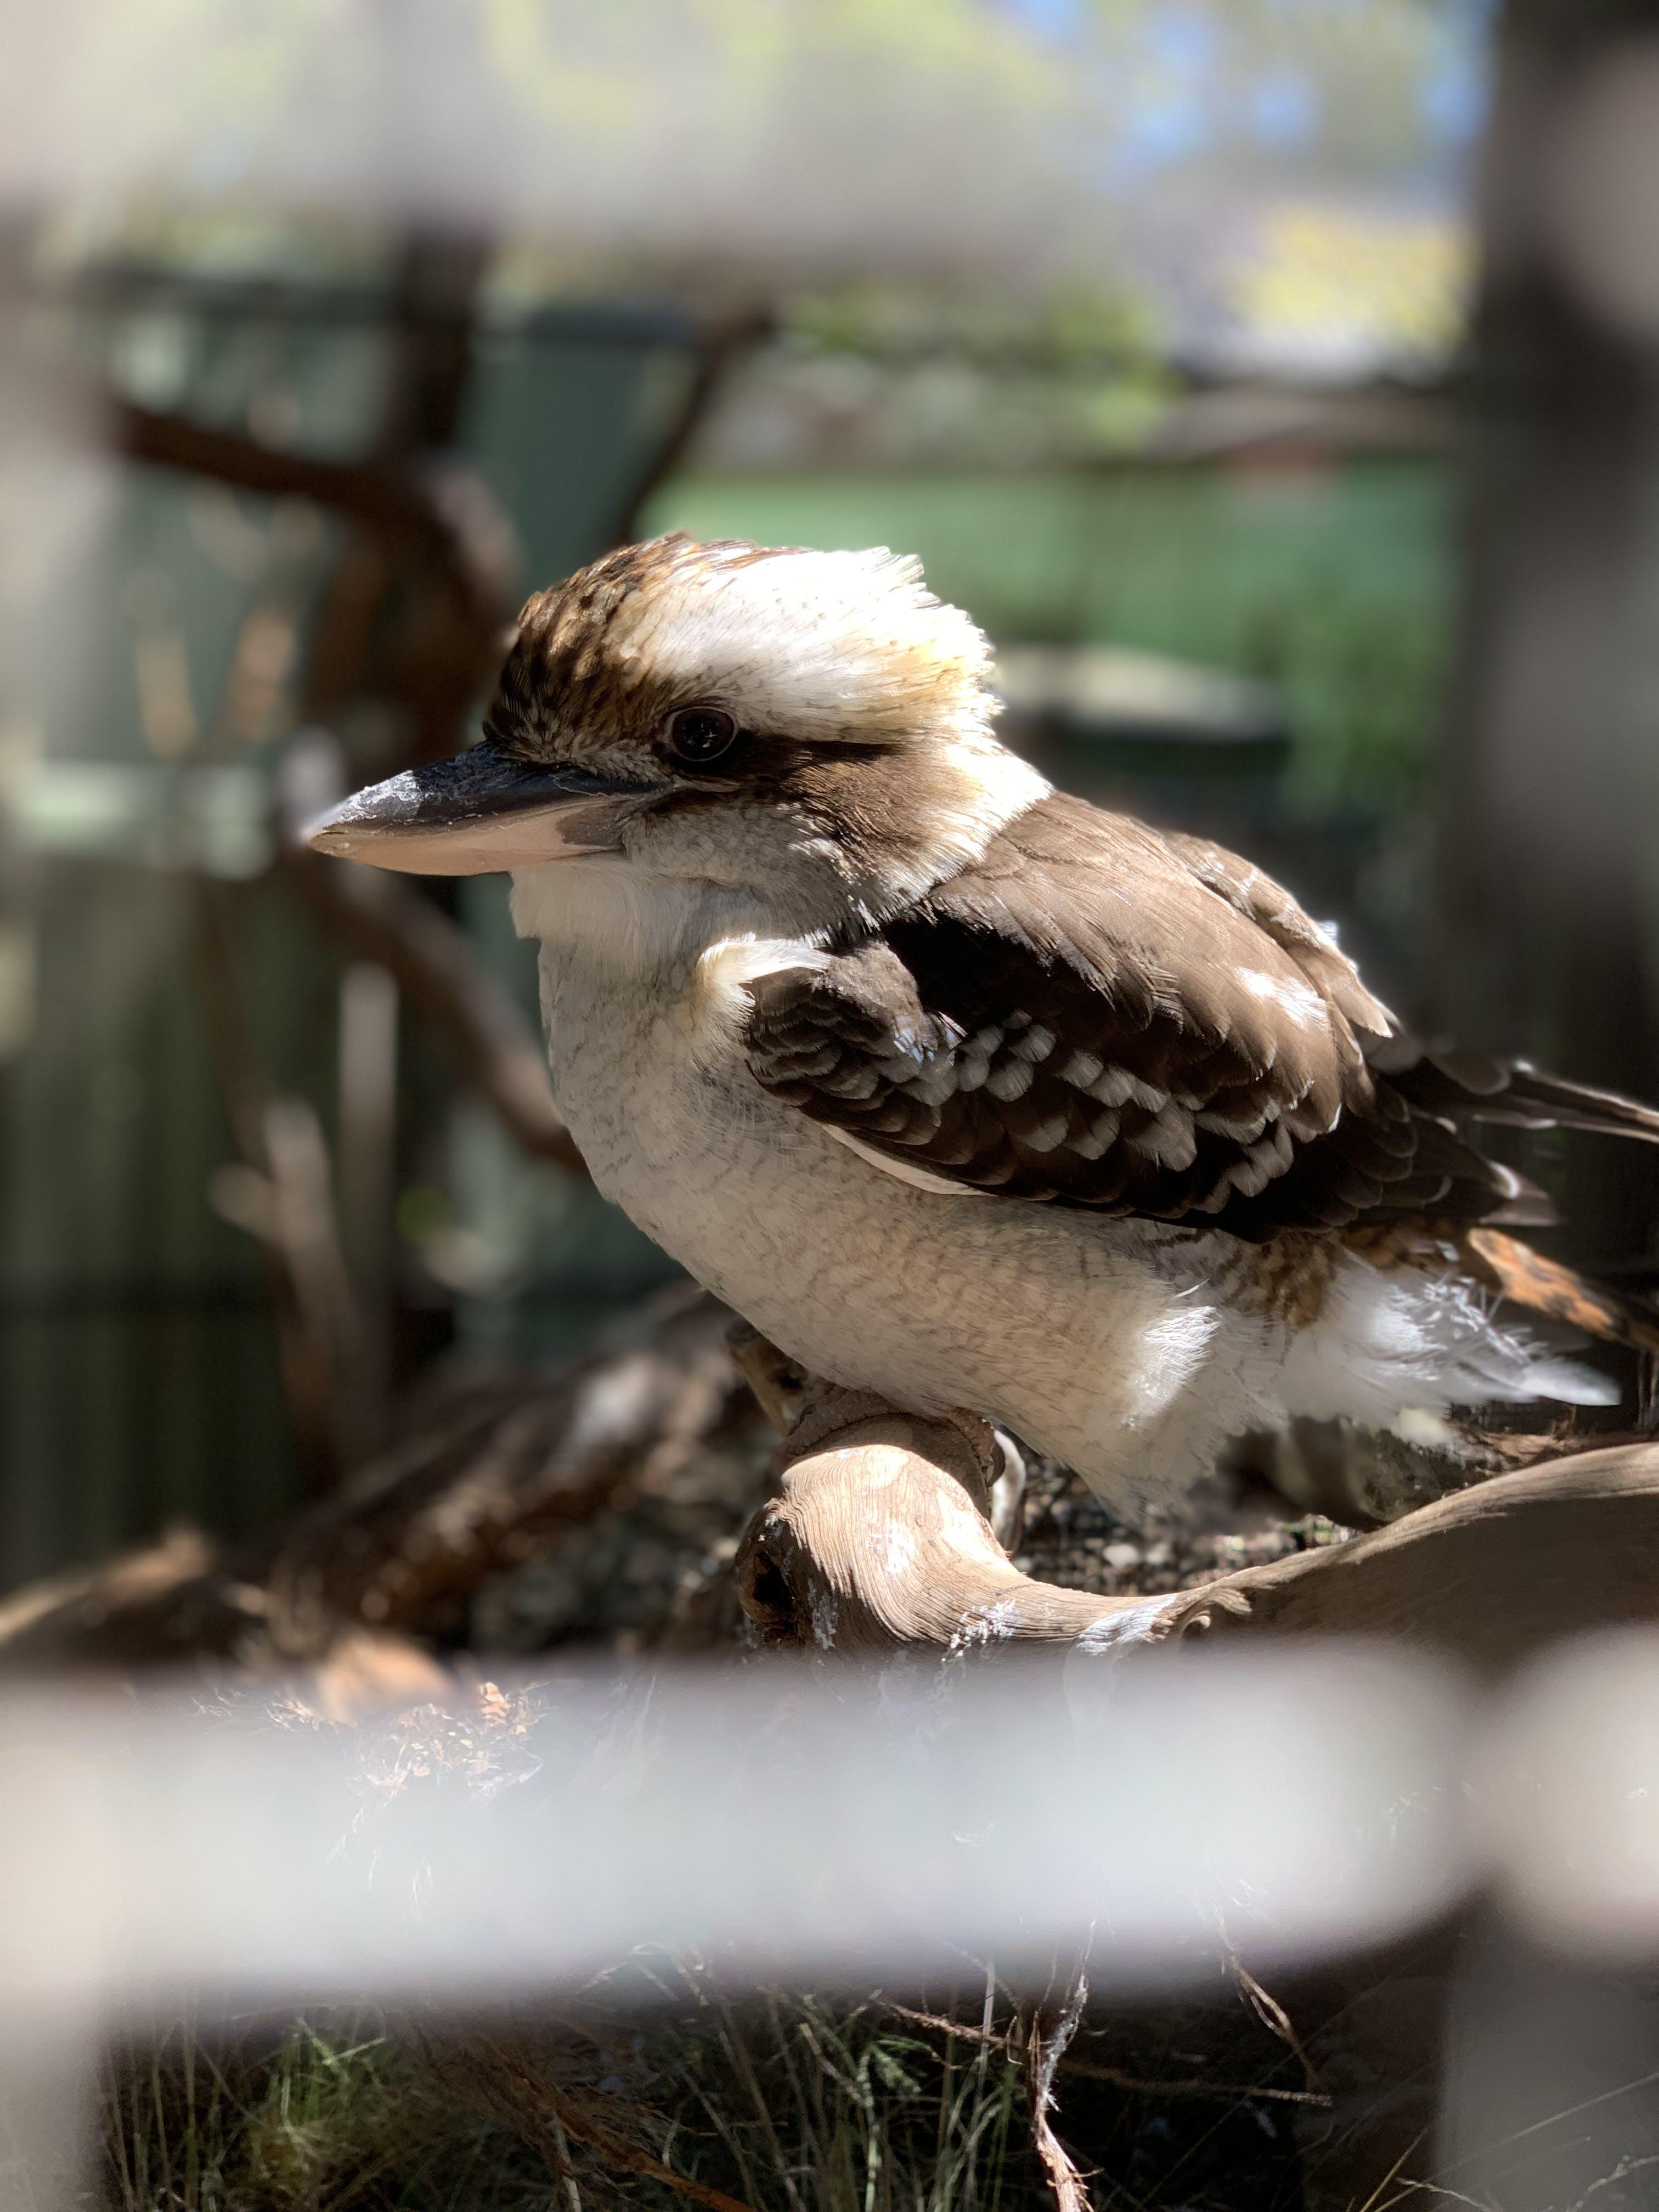 Free stock photo of kookaburra